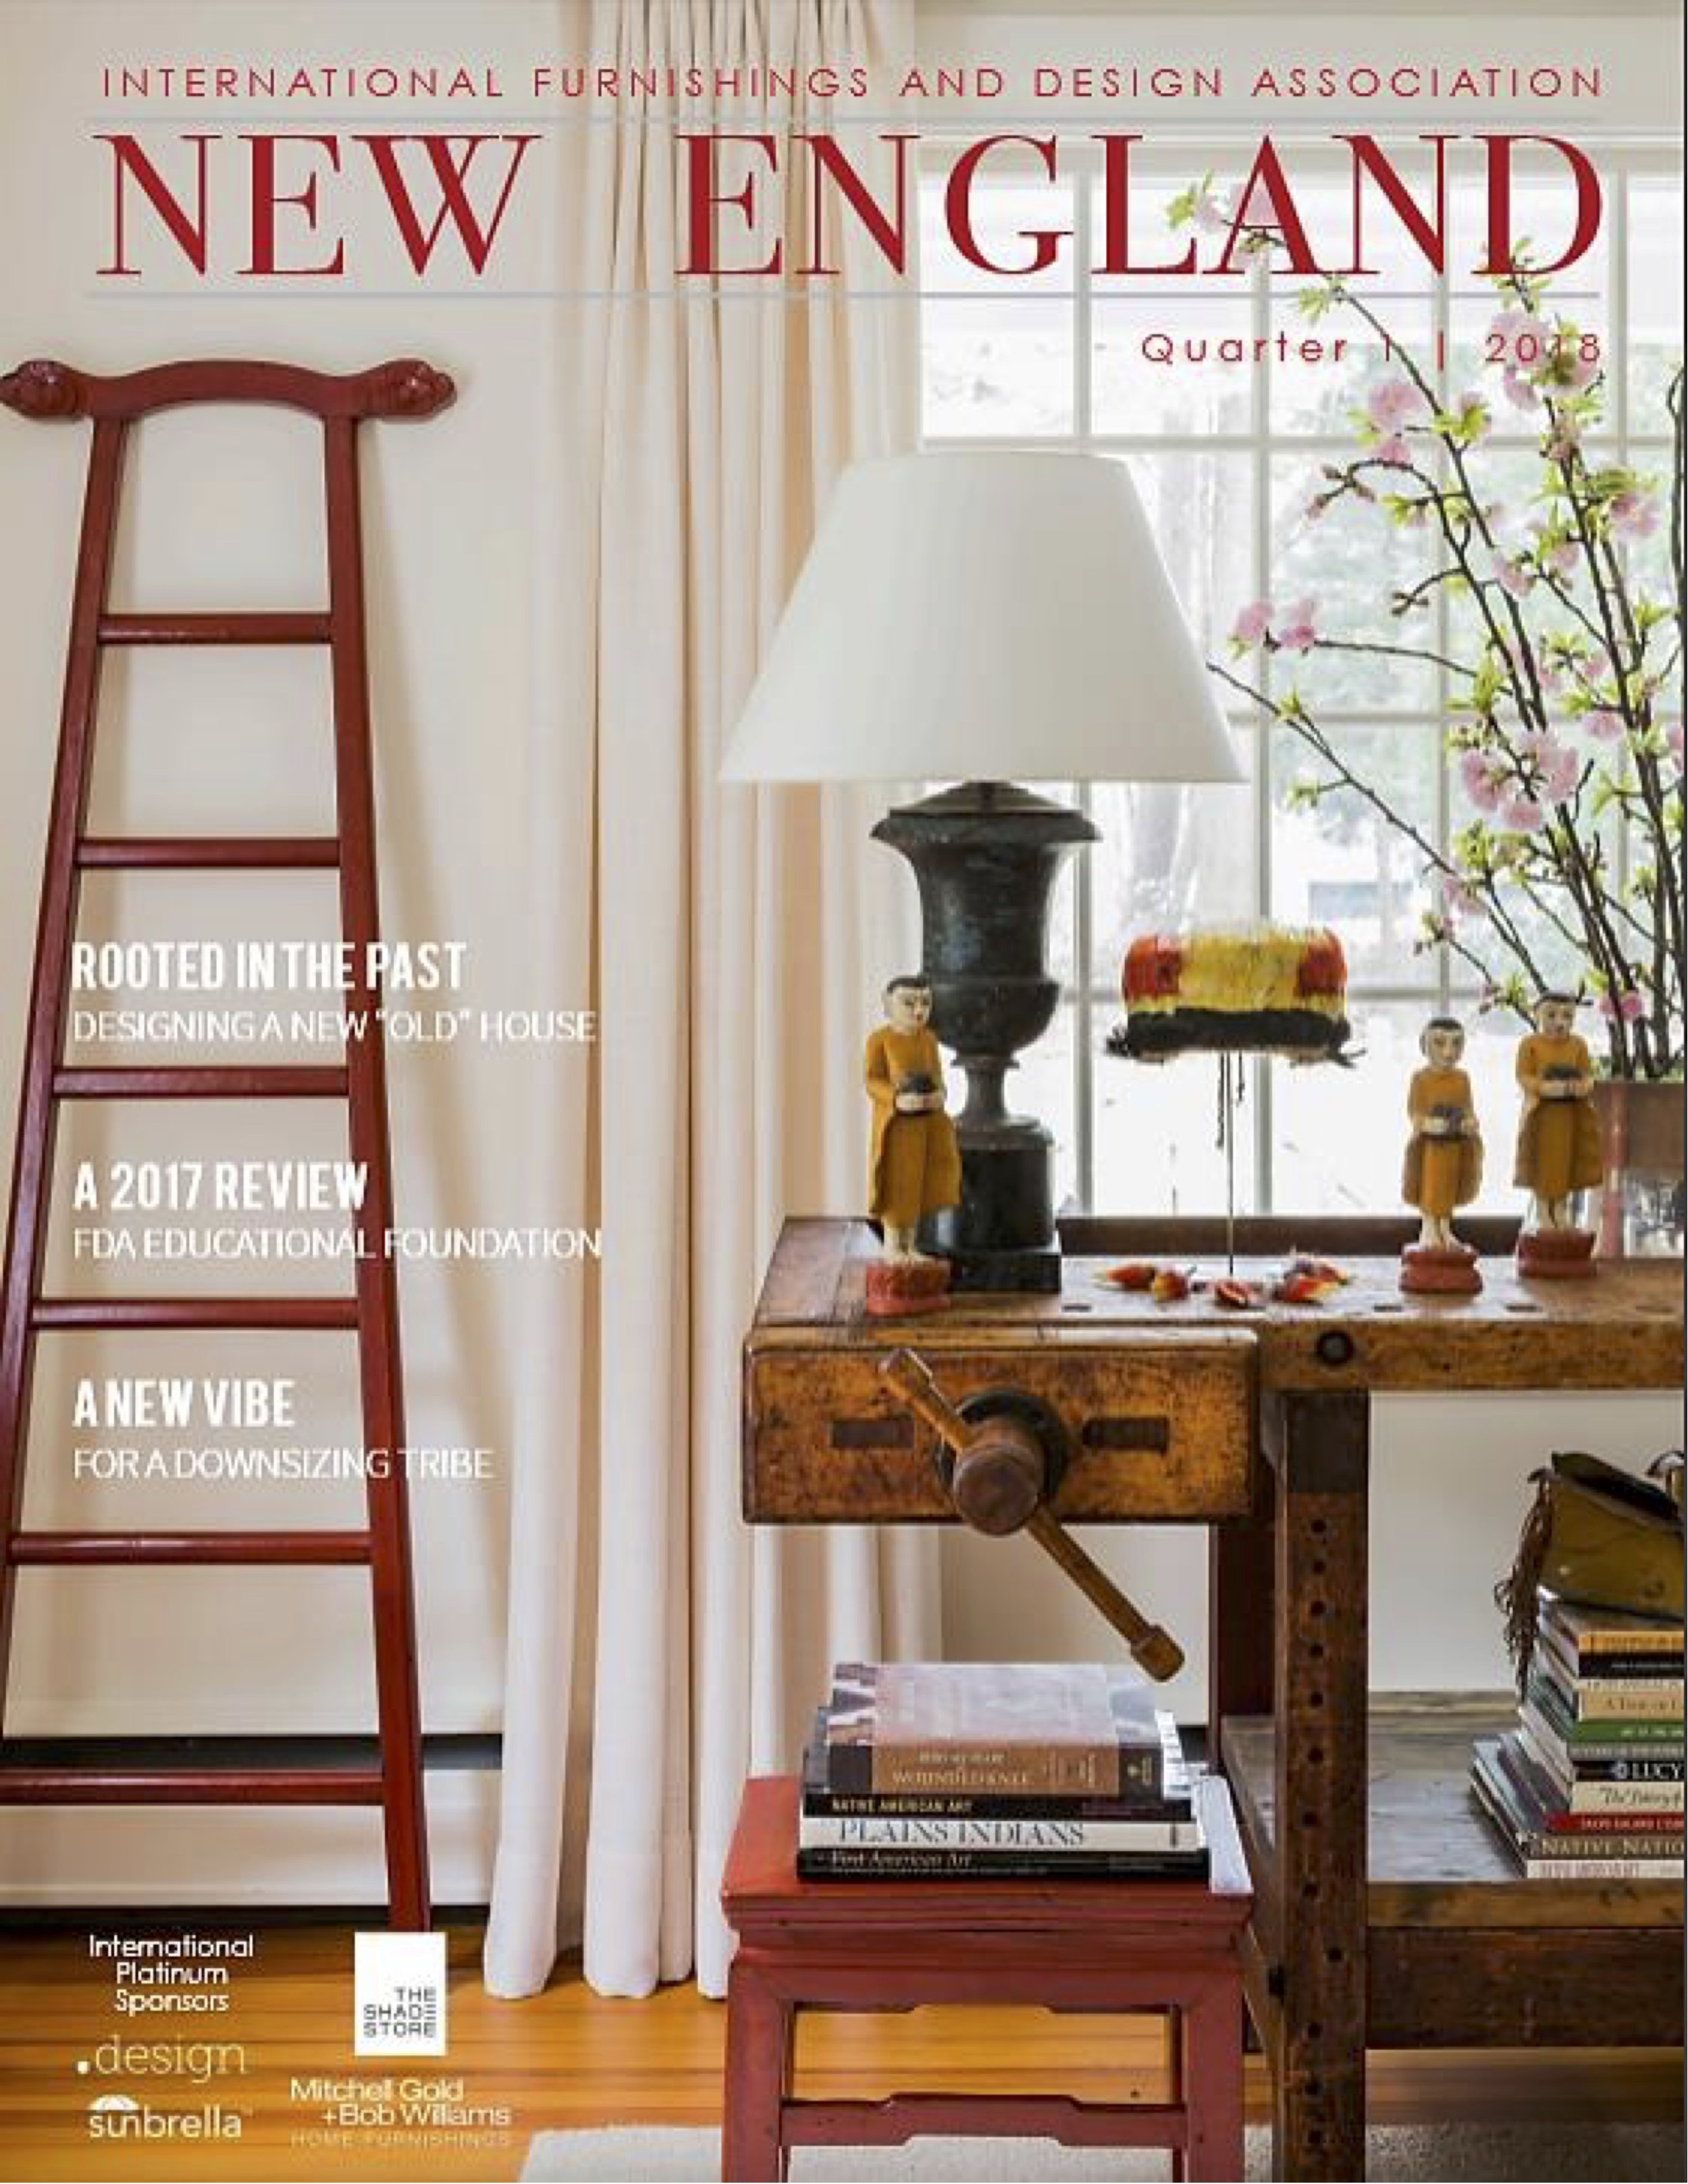 IFDA Magazine - Interior design in Boston by Dane Austin Design